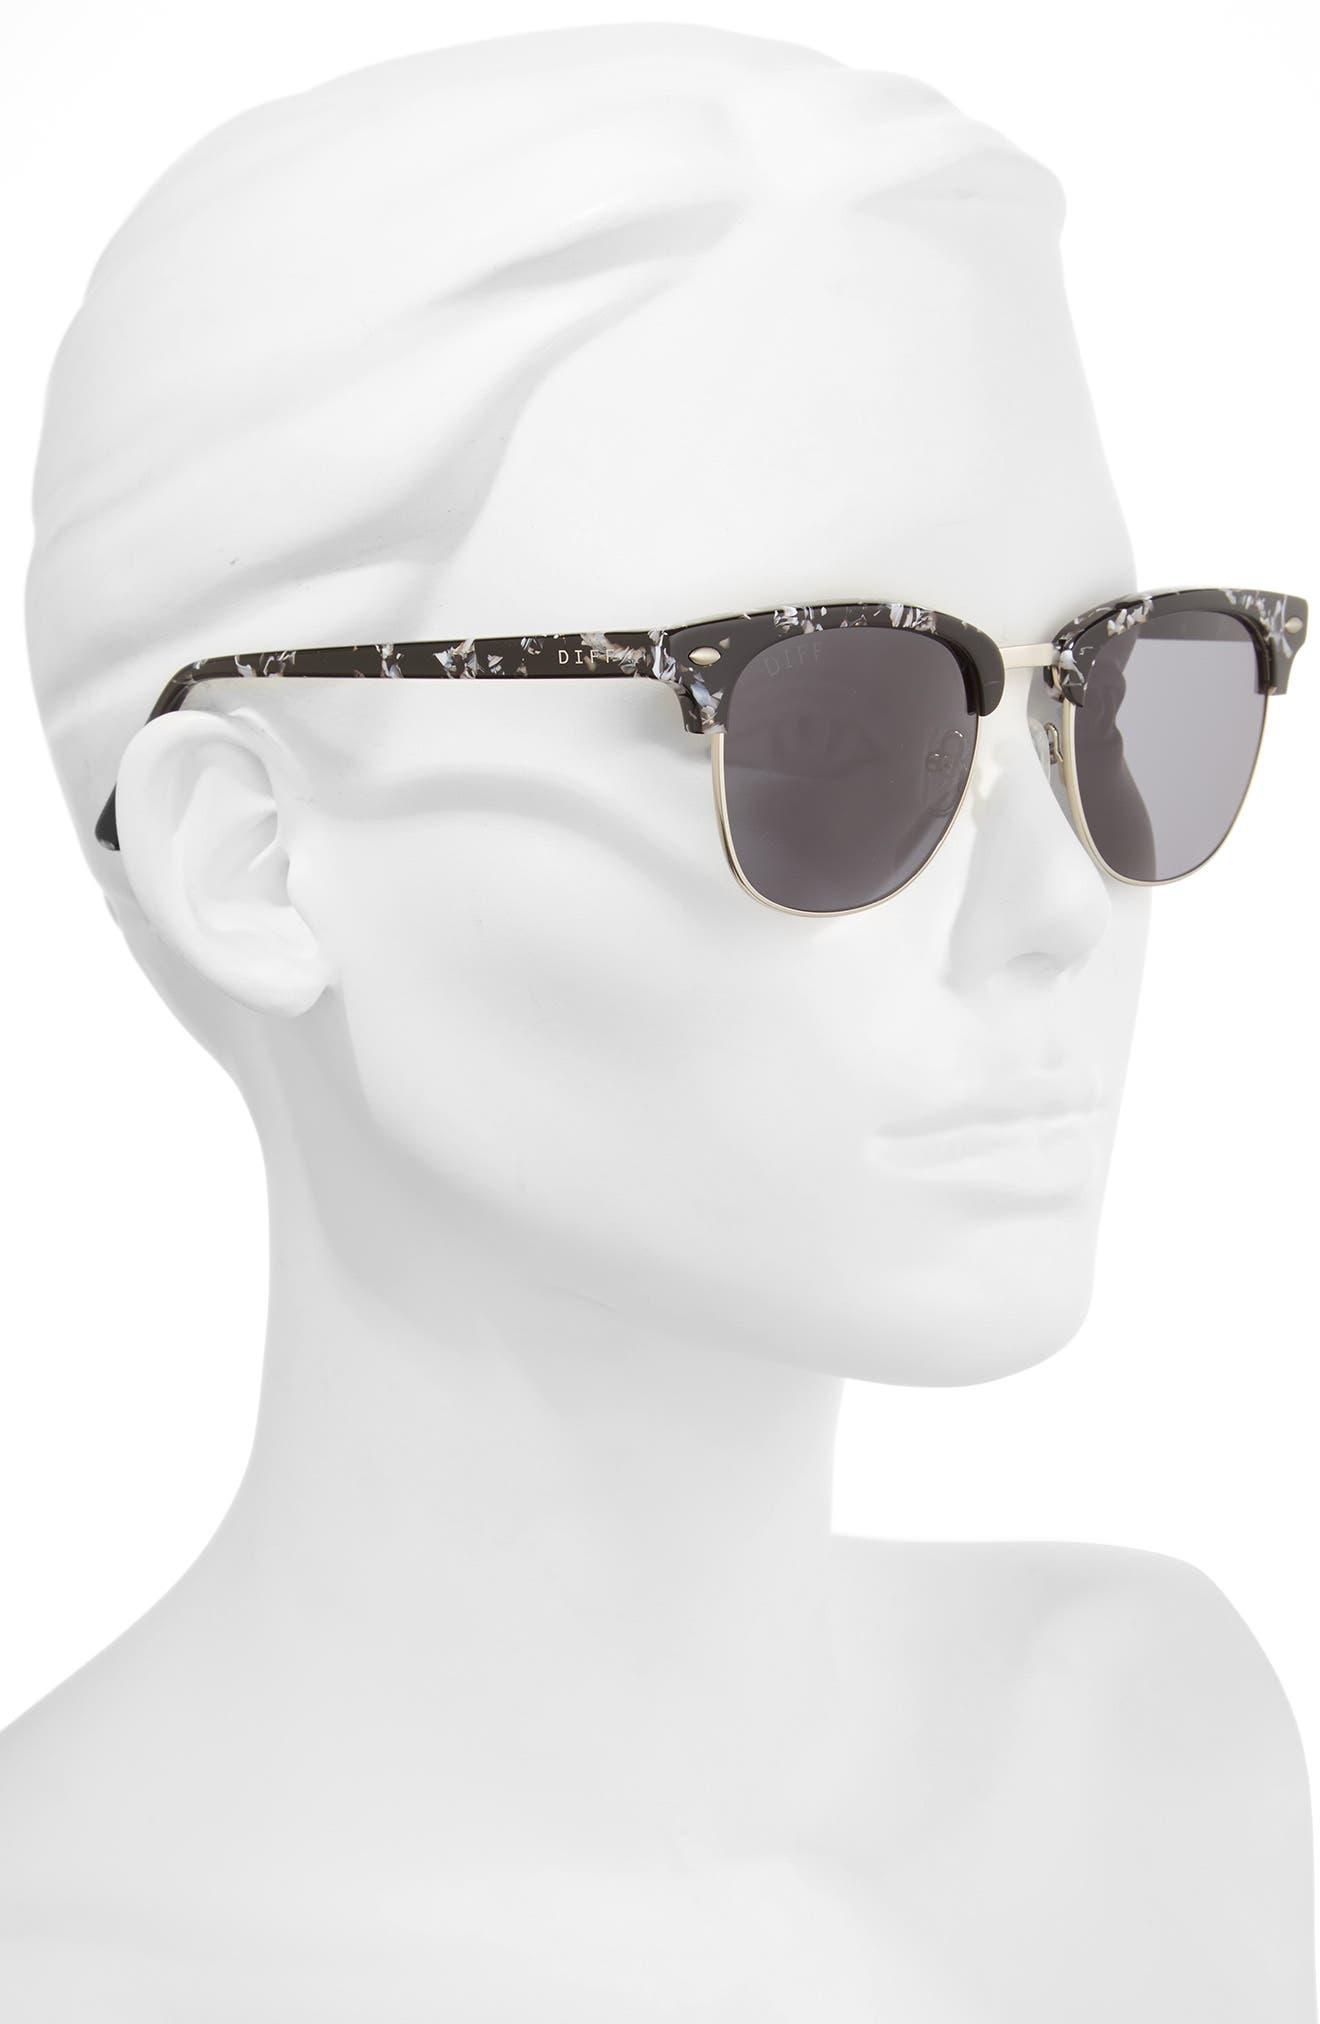 Barry 51mm Polarized Retro Sunglasses,                             Alternate thumbnail 9, color,